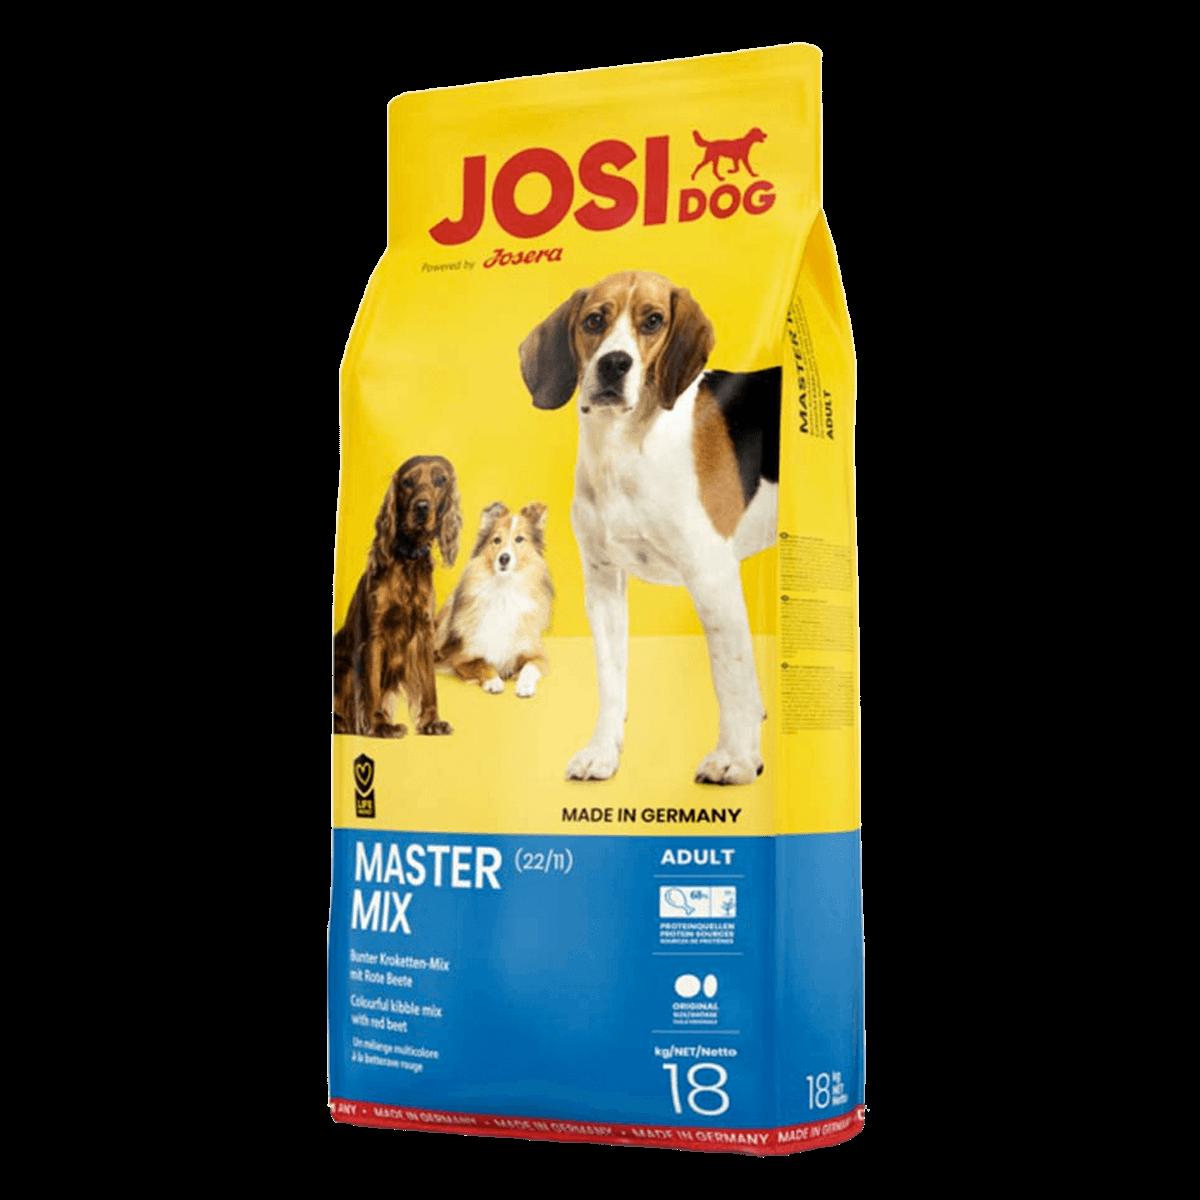 Josera JosiDog Master Mix 22/11, 18 кг - корм Йозера для ...